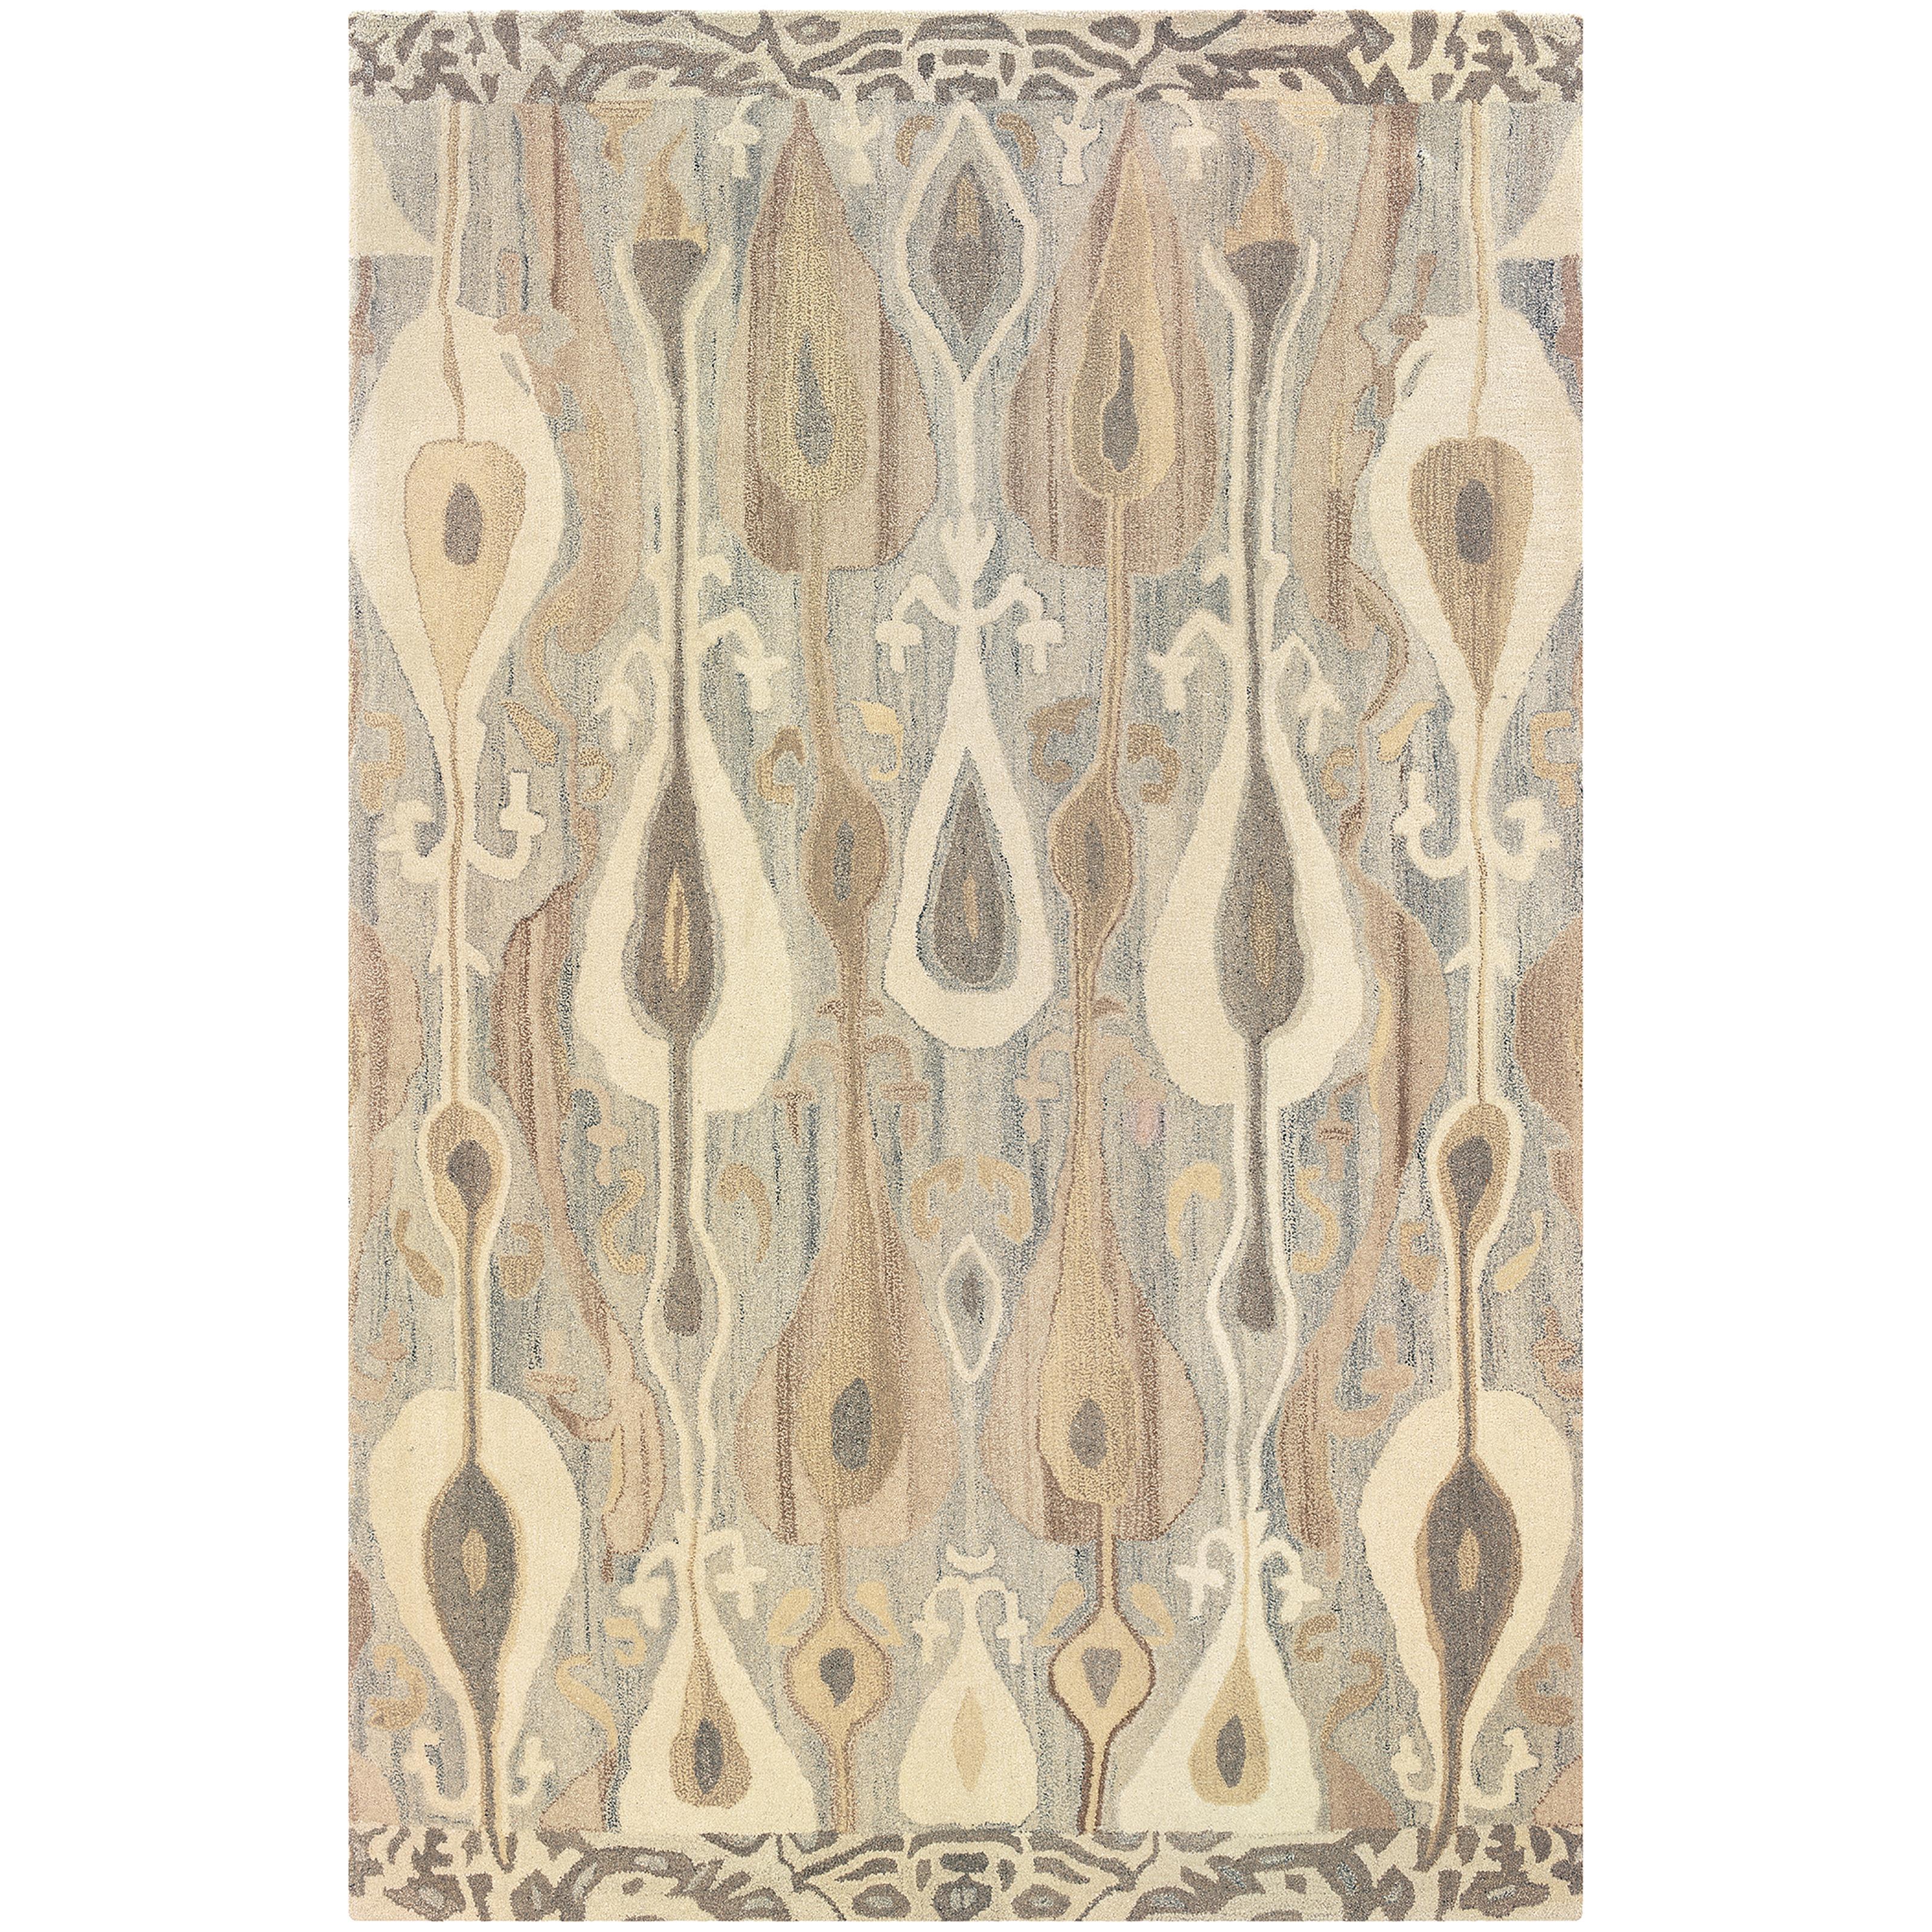 "Anastasia 10' 0"" X 13' 0"" Rug by Oriental Weavers at Steger's Furniture"